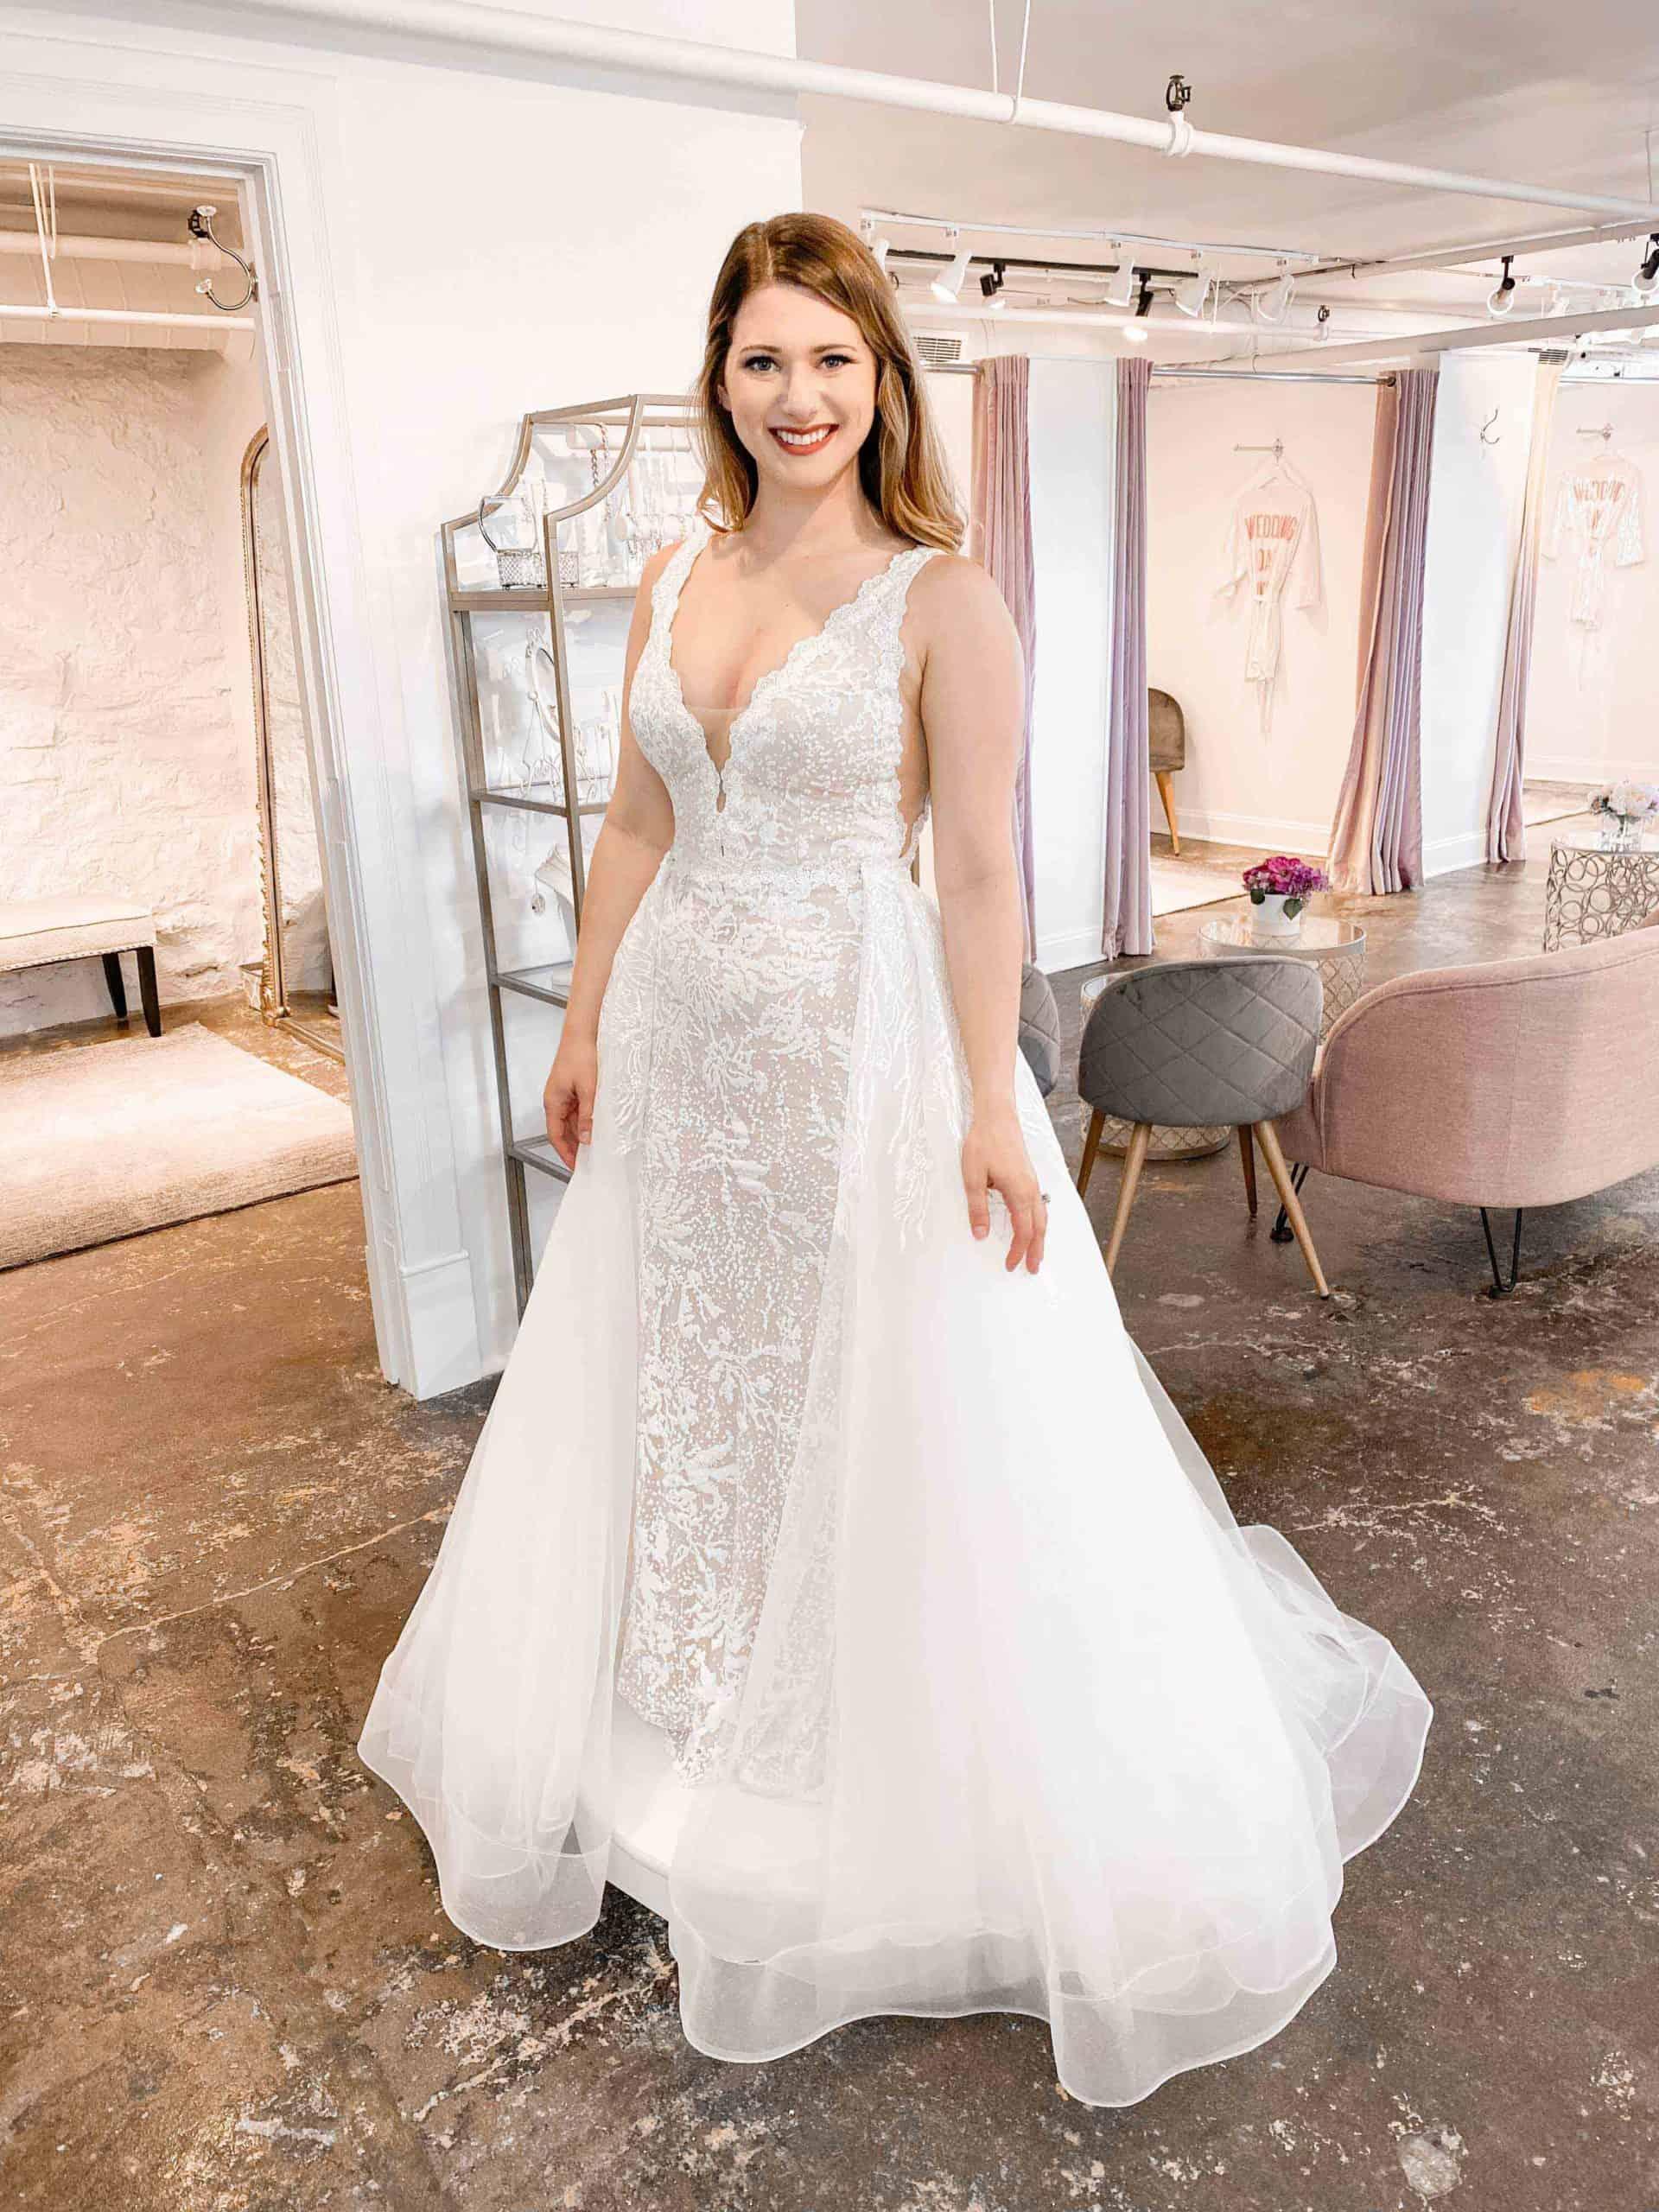 sheath- ballgown - lace- beading- detachable skirt- beaching wedding